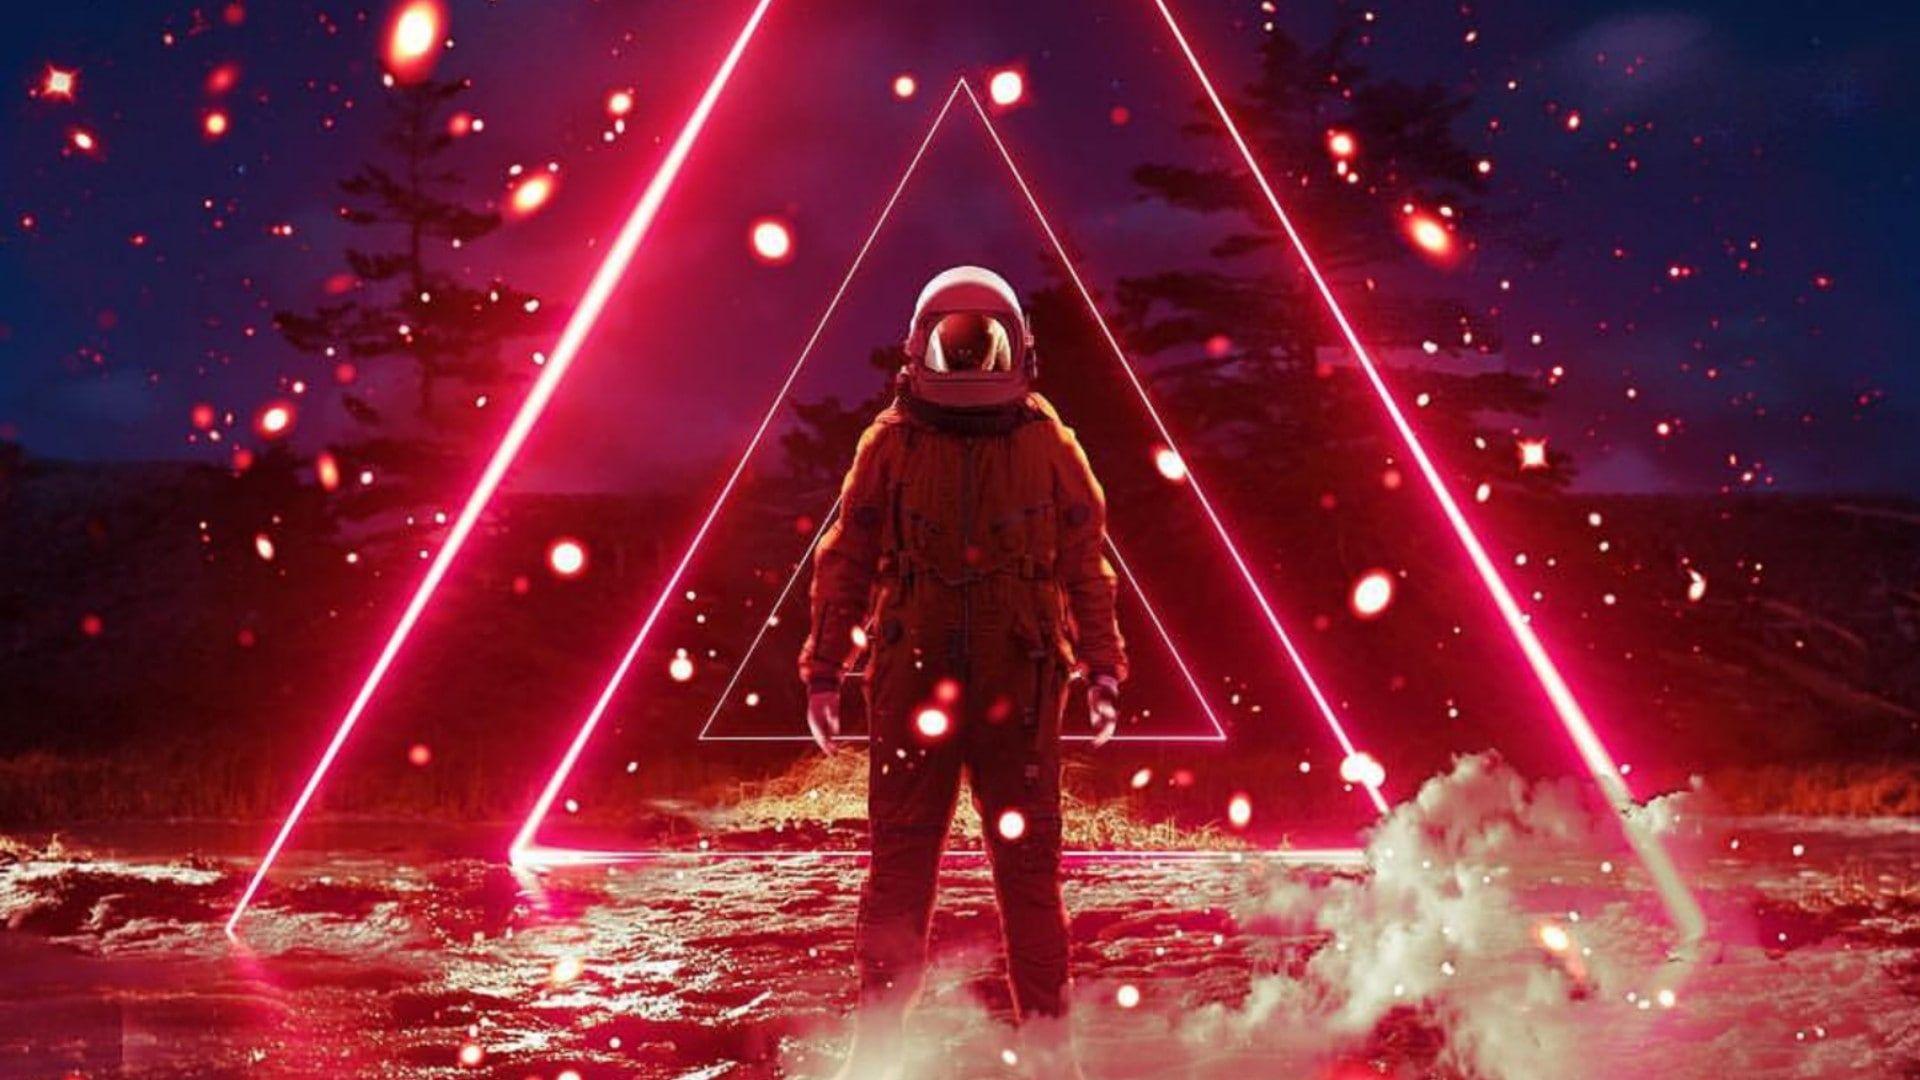 Synthwave Virtualreality Vaporwave Retrowave Astronaut Futuristic Digital Art 1080p Wallpaper Hdwallpaper Des Vaporwave Wallpaper Vaporwave Synthwave